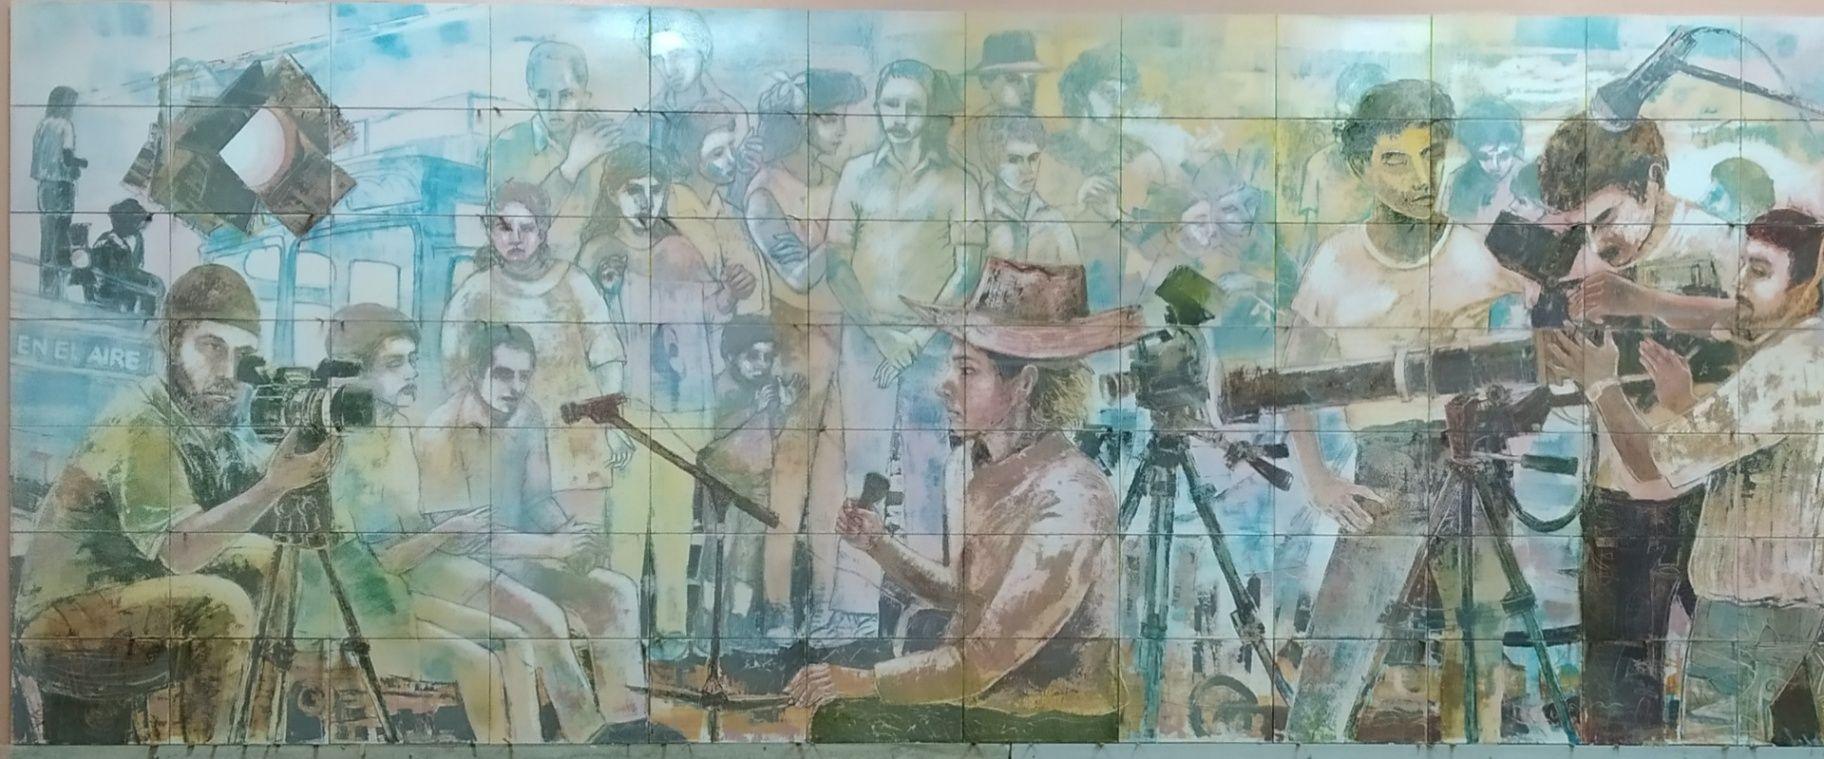 Obra: Mural cerámica Telecentro villa Clara